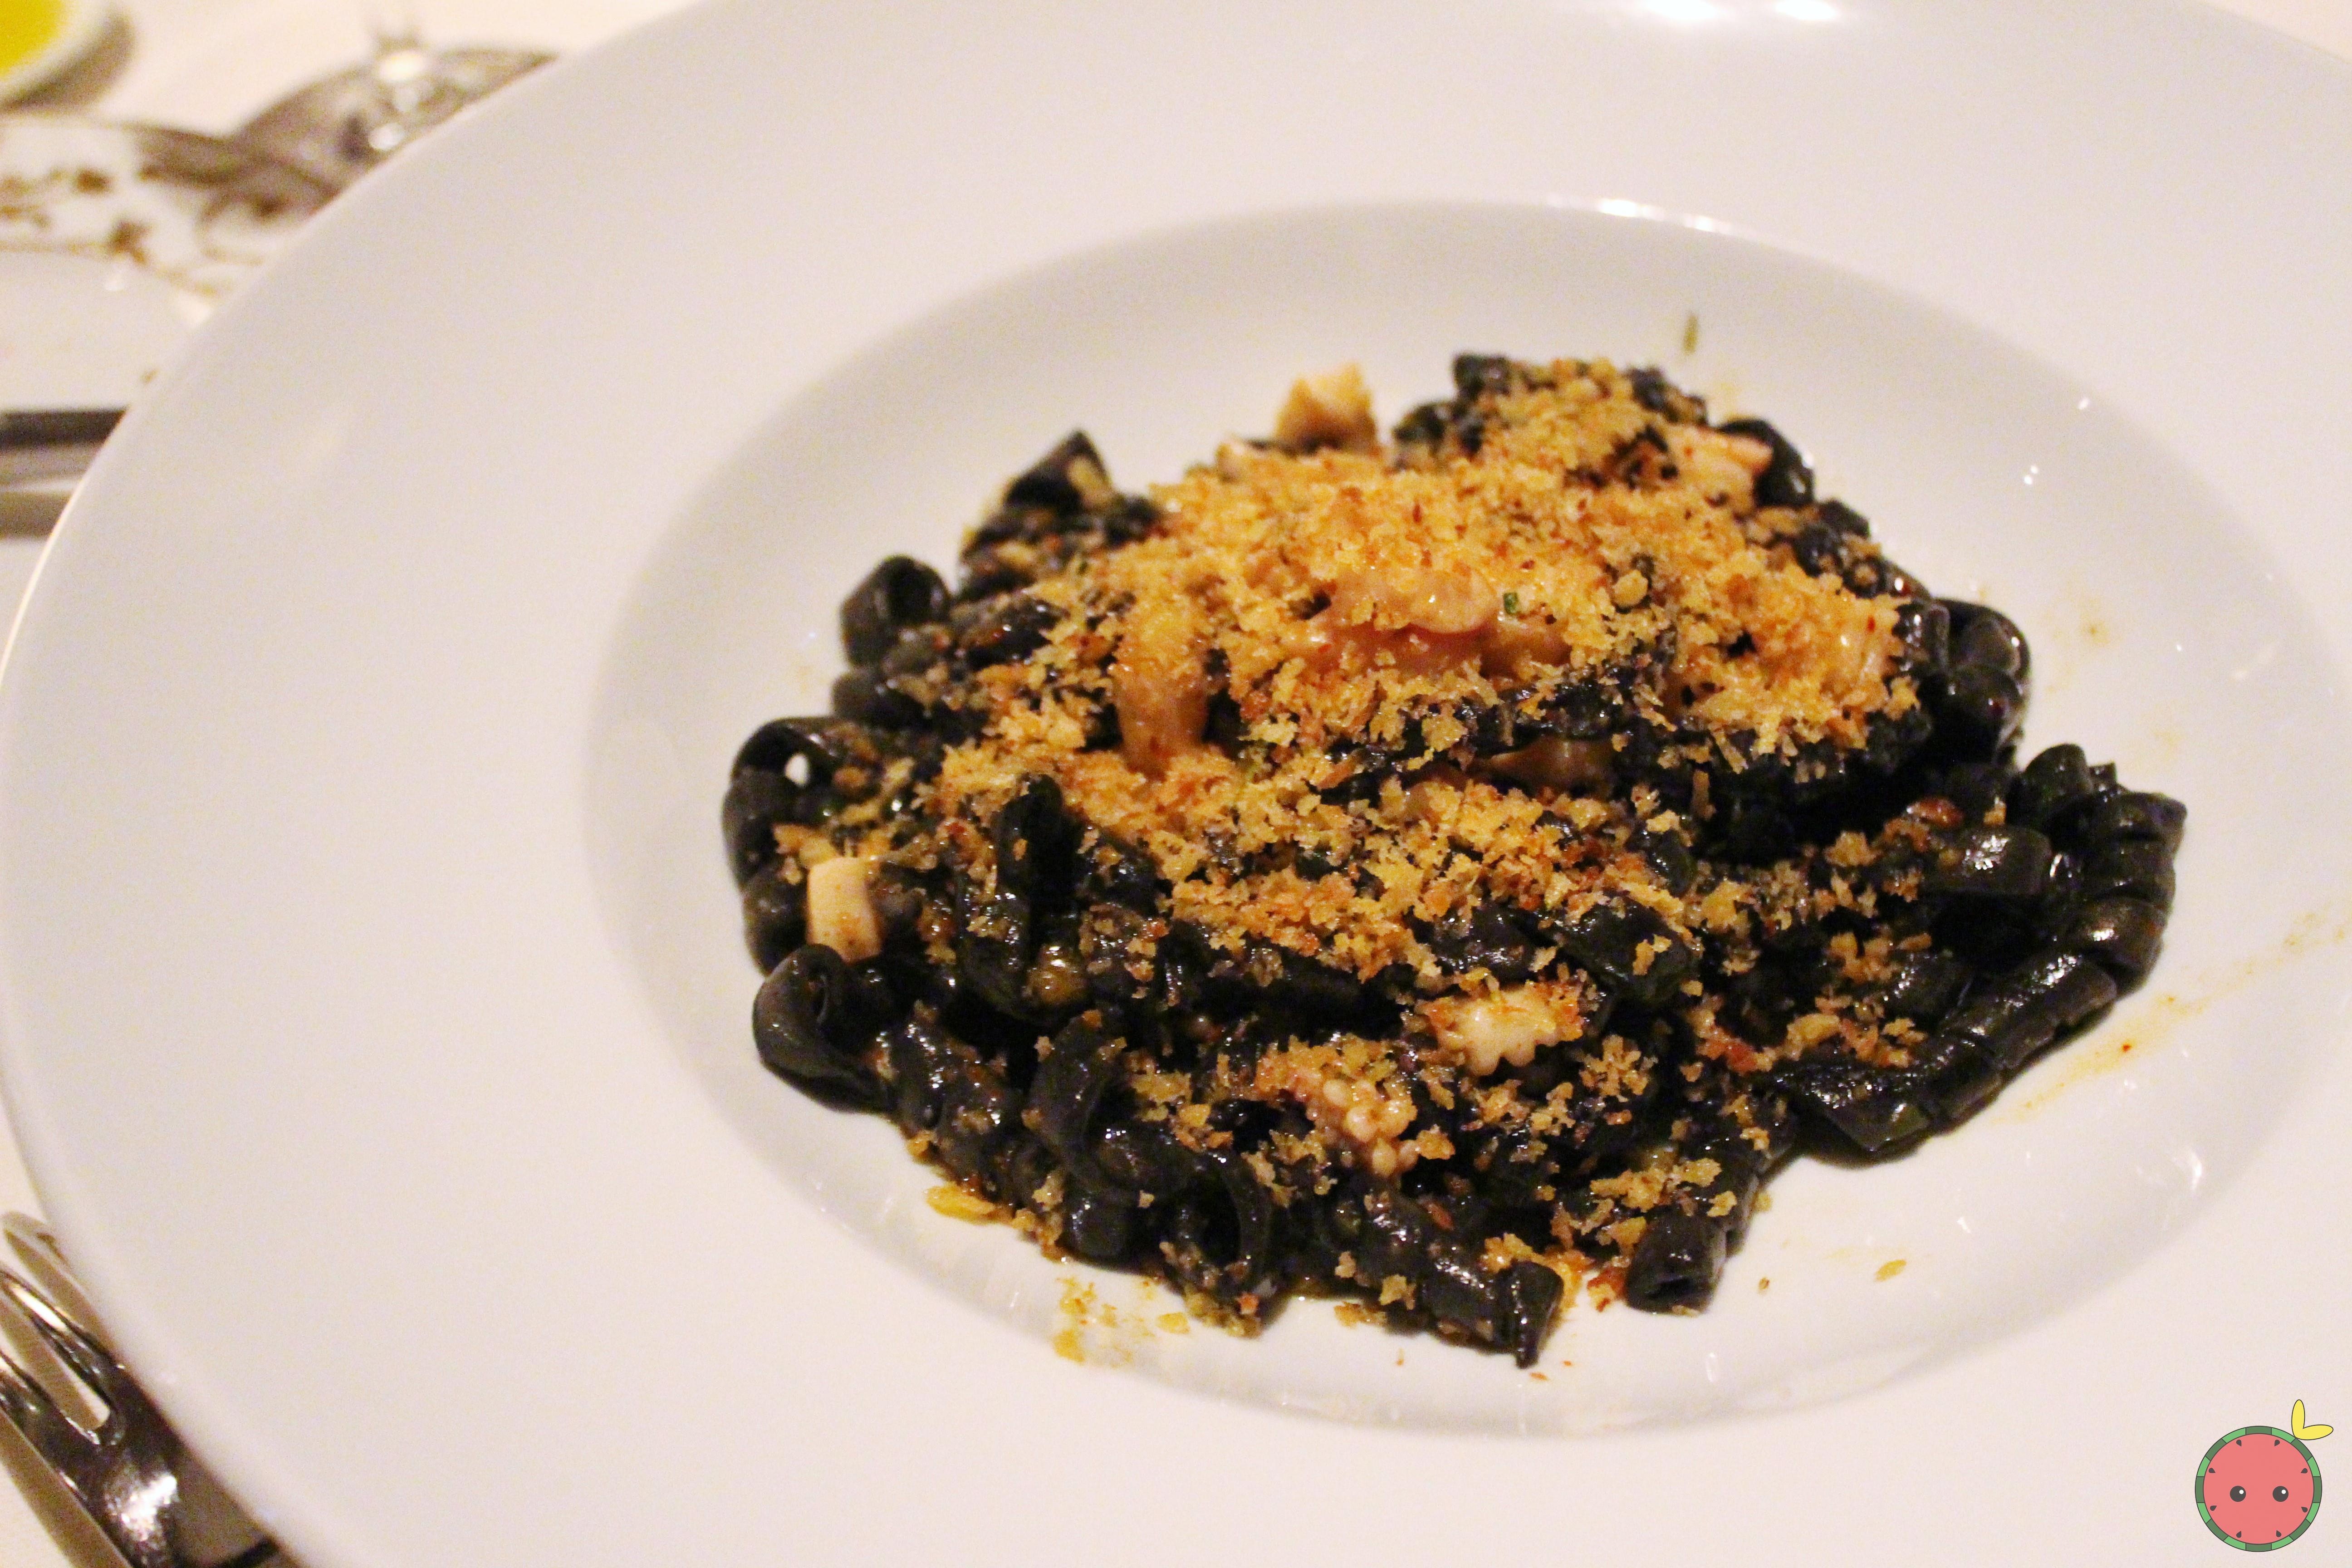 Trofie Nero - Ligurian crustacean ragu, seppia, scallops, spiced mollica